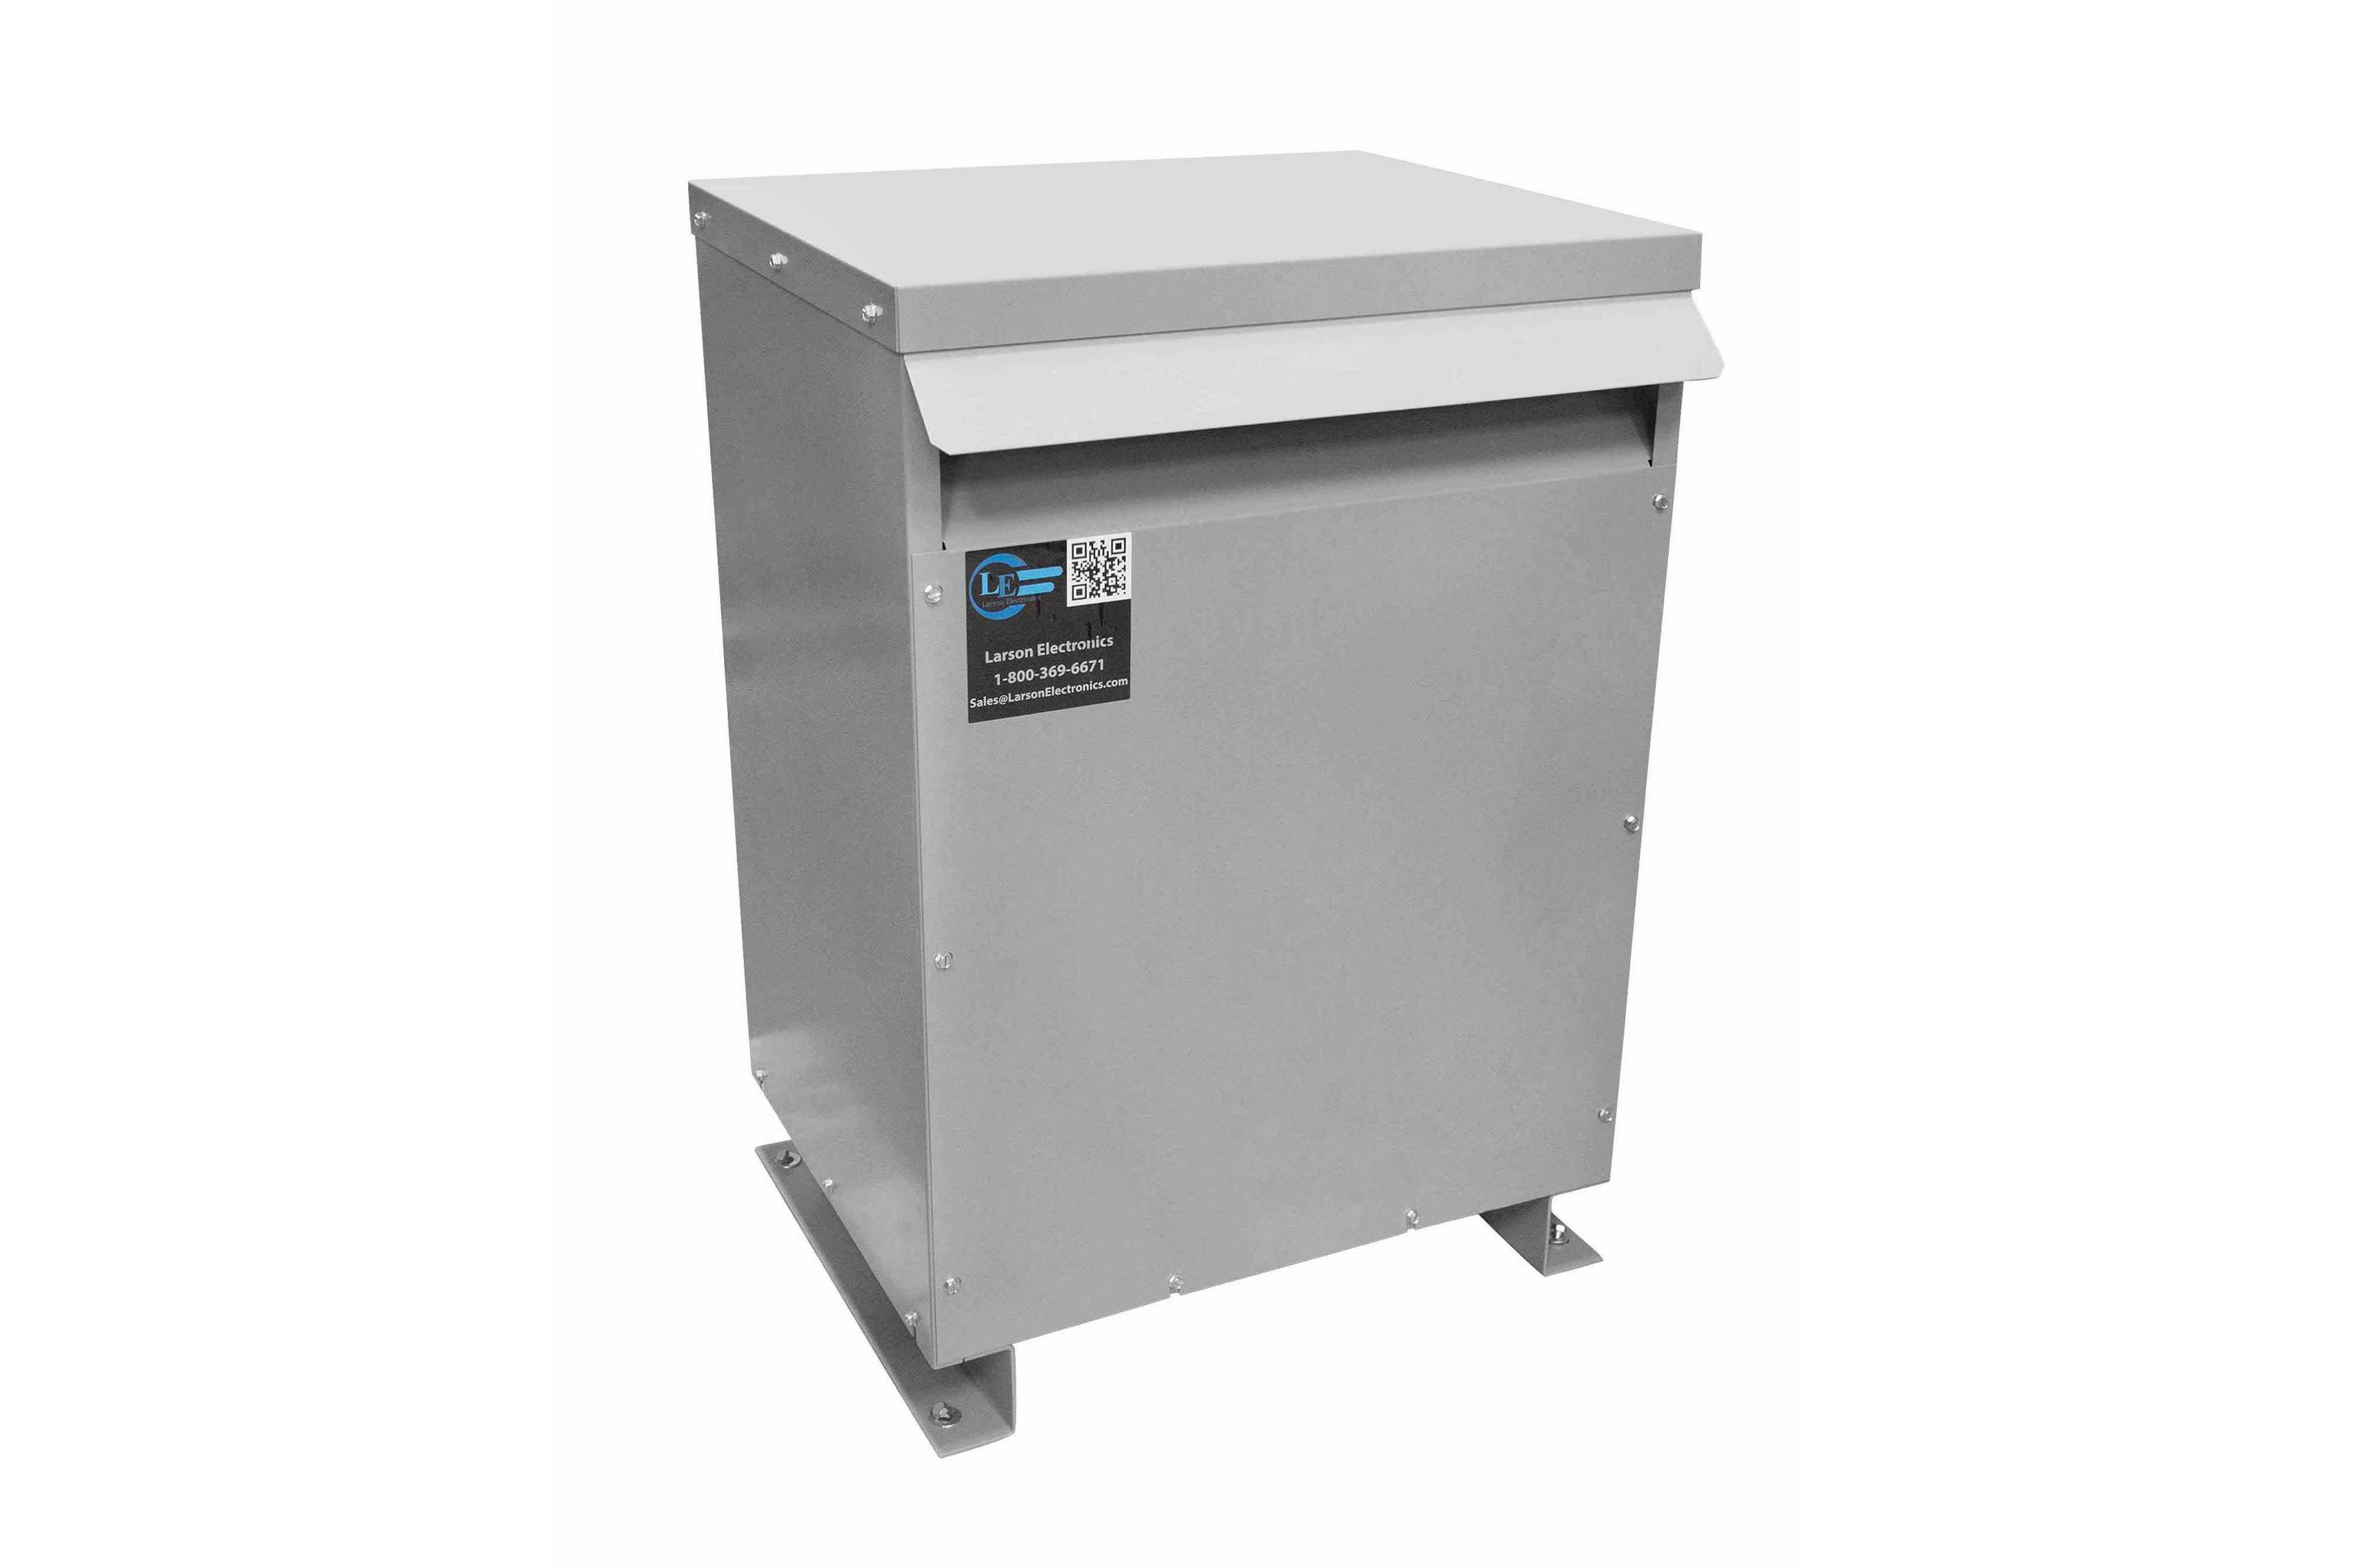 70 kVA 3PH Isolation Transformer, 208V Wye Primary, 208V Delta Secondary, N3R, Ventilated, 60 Hz